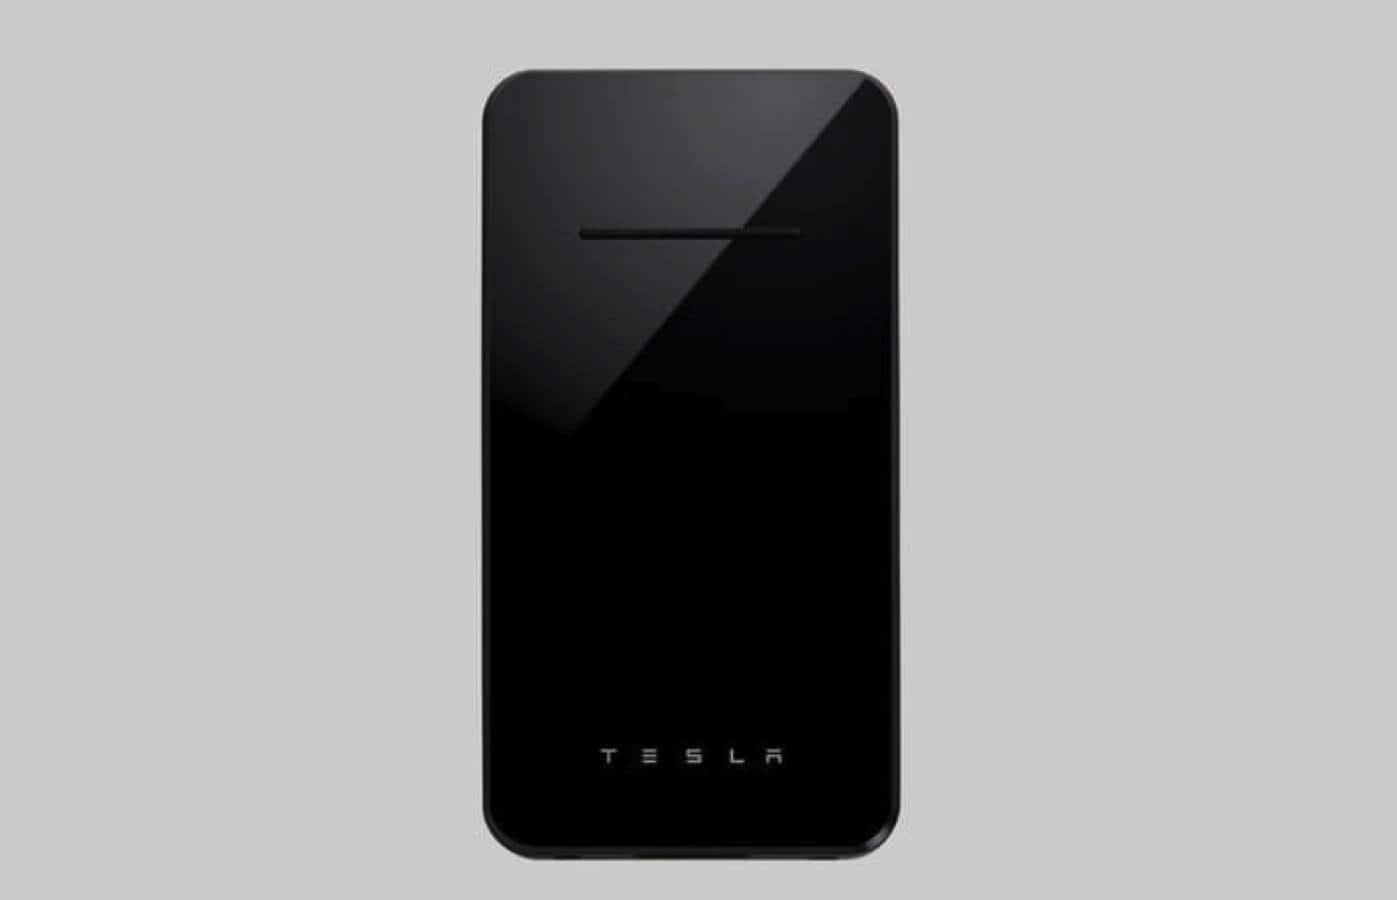 tesla charging pad